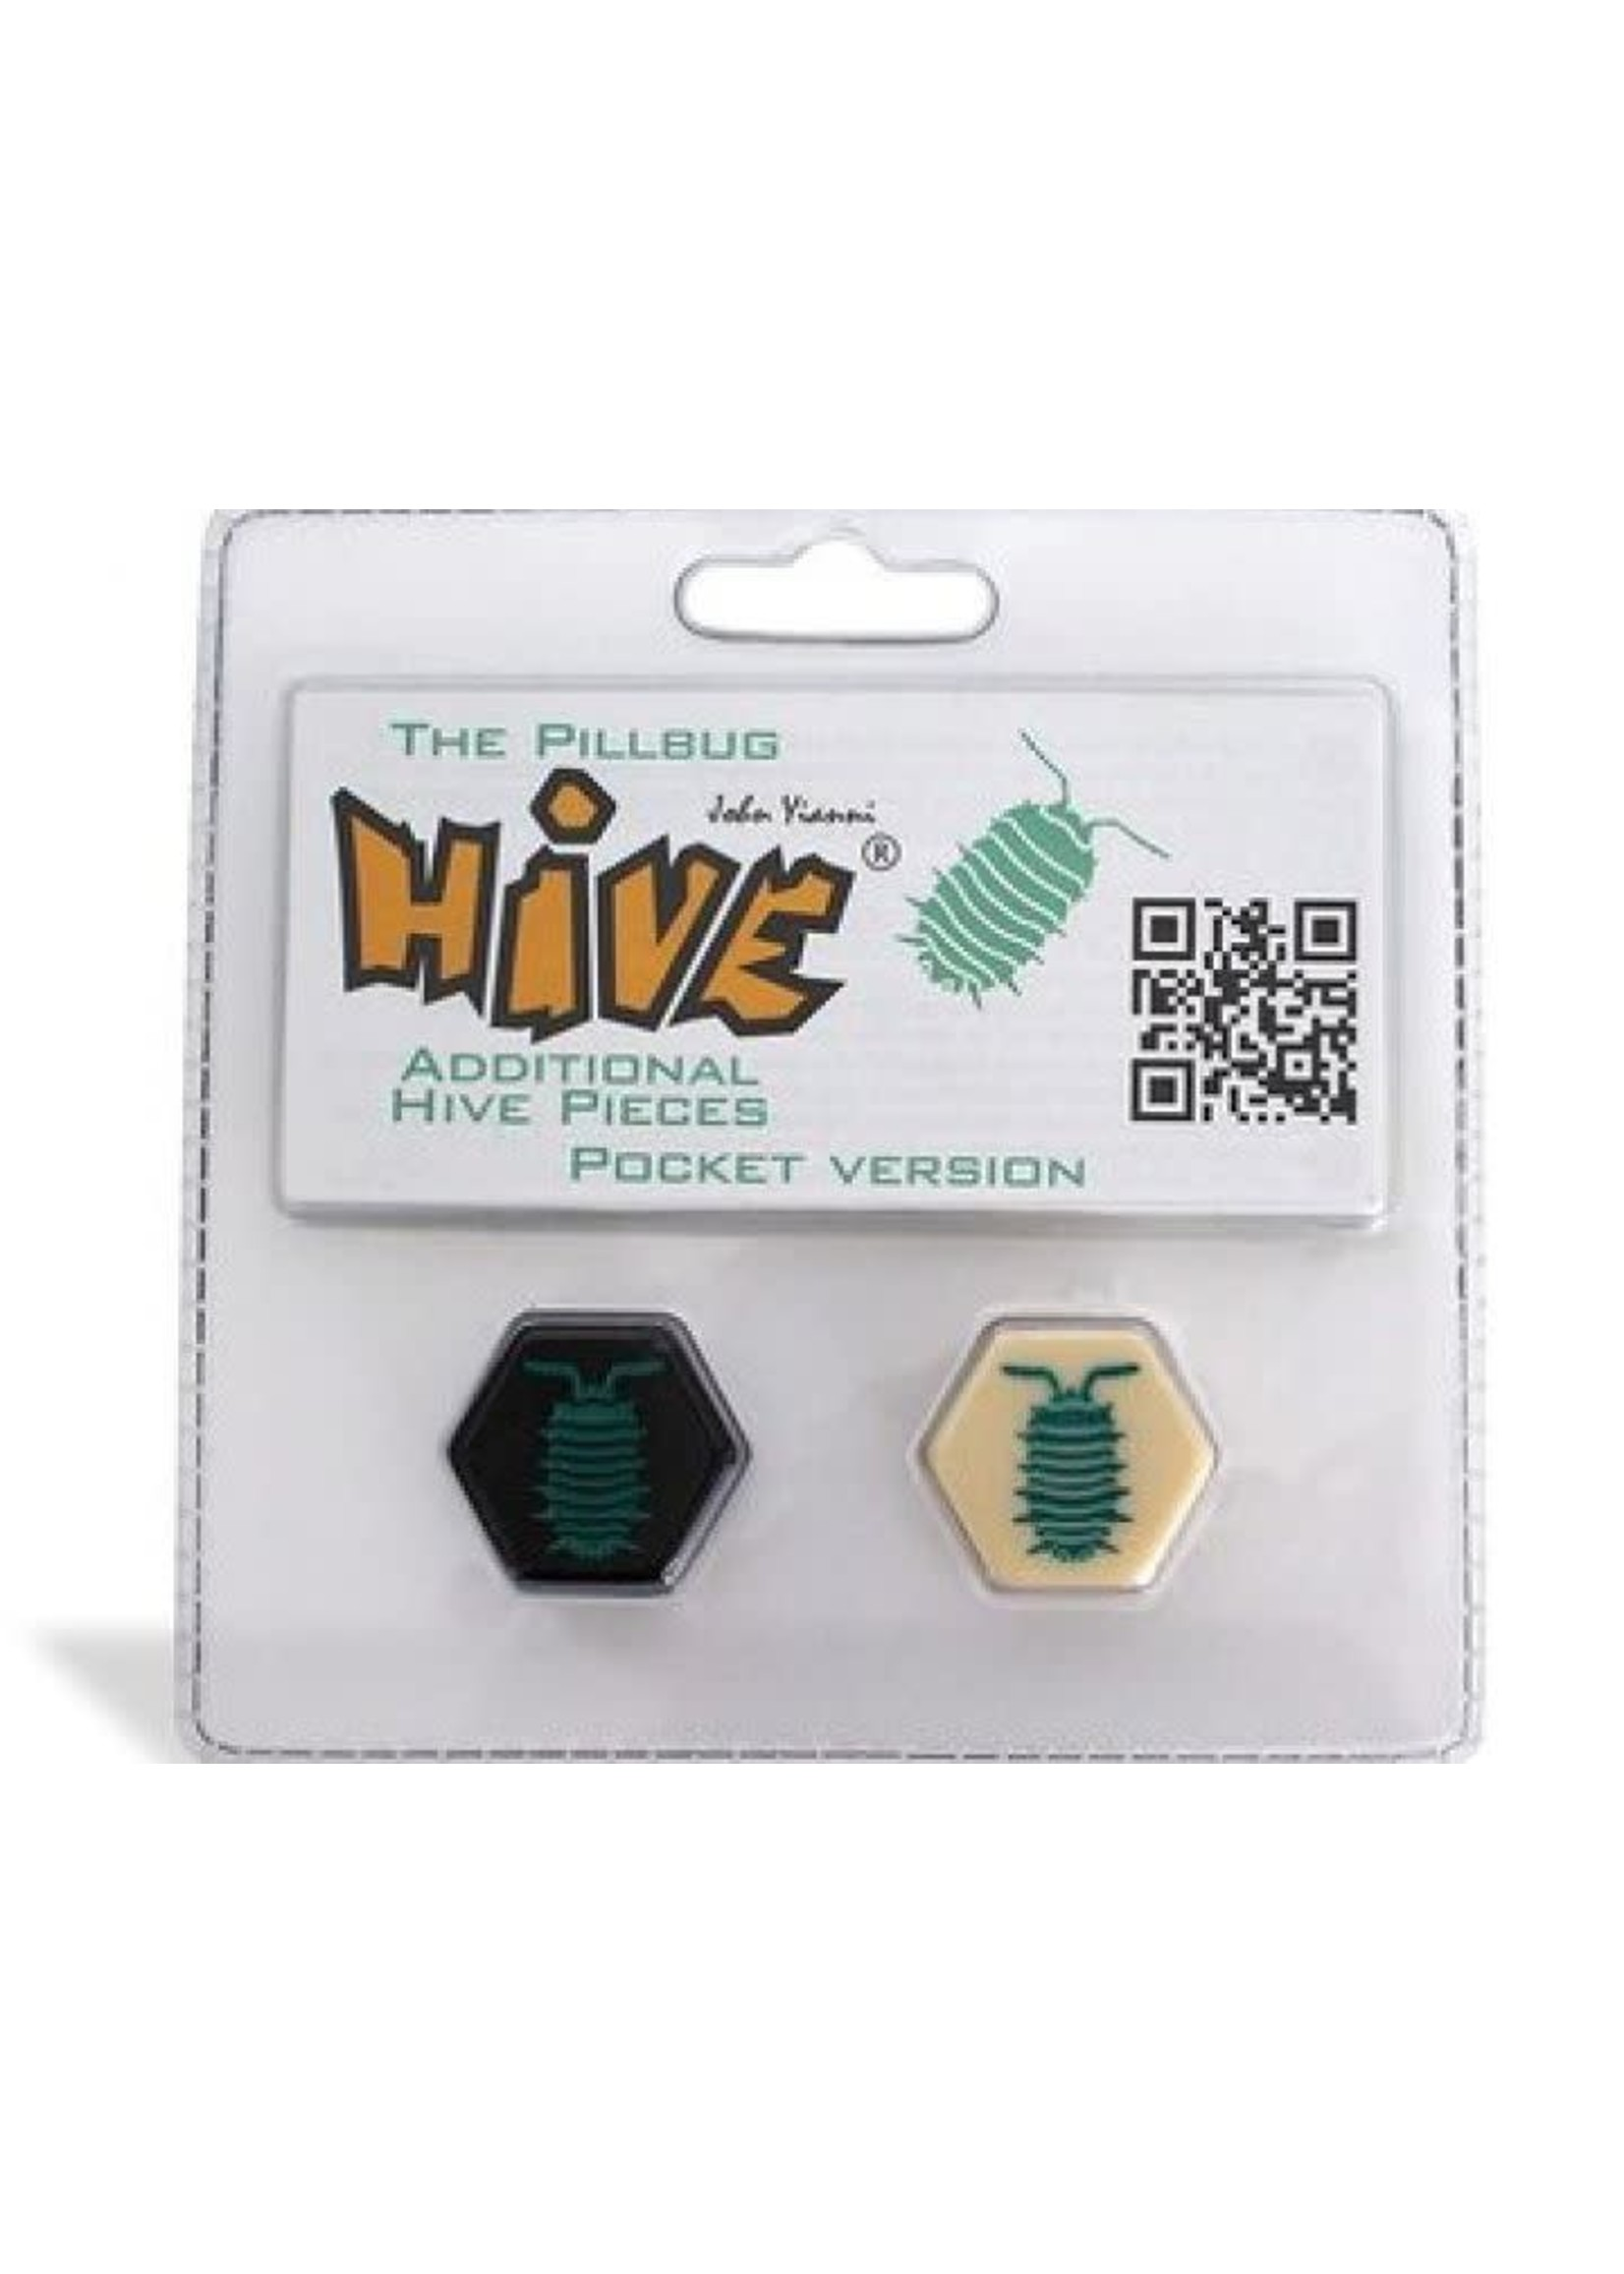 Hive Pillbug Pocket